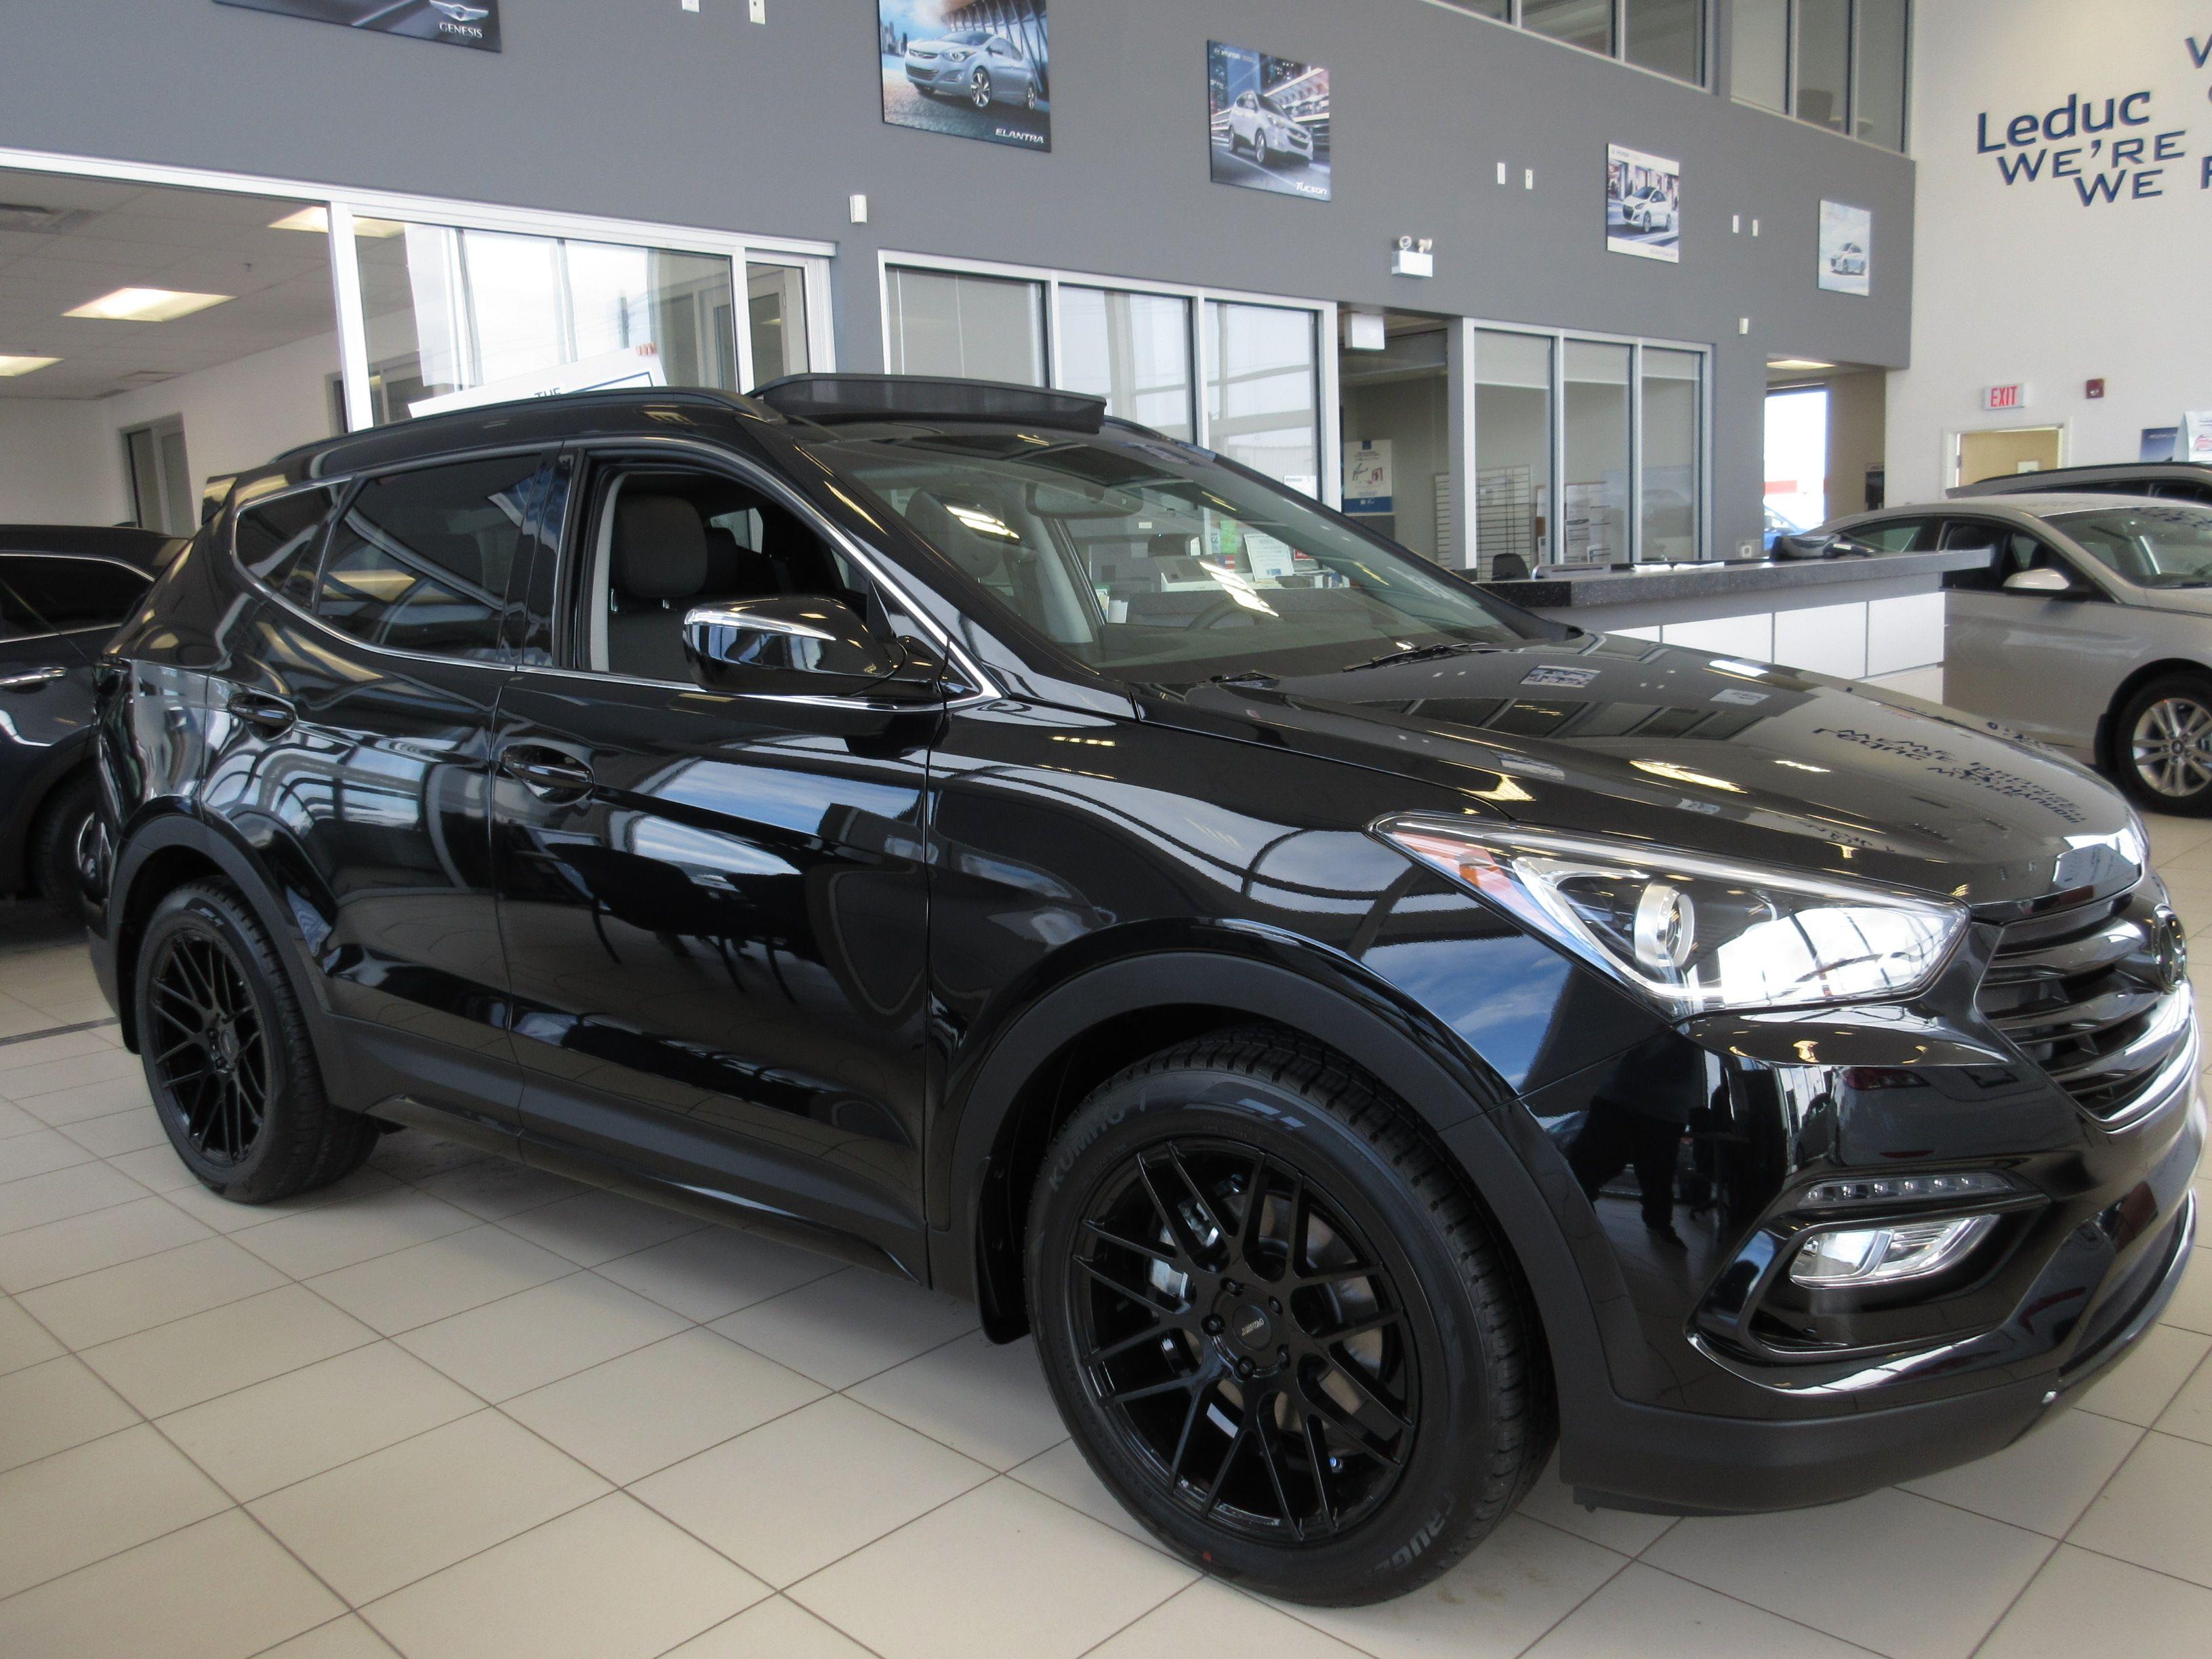 2017 Hyundai Santa Fe Sport Limited Black Edition This